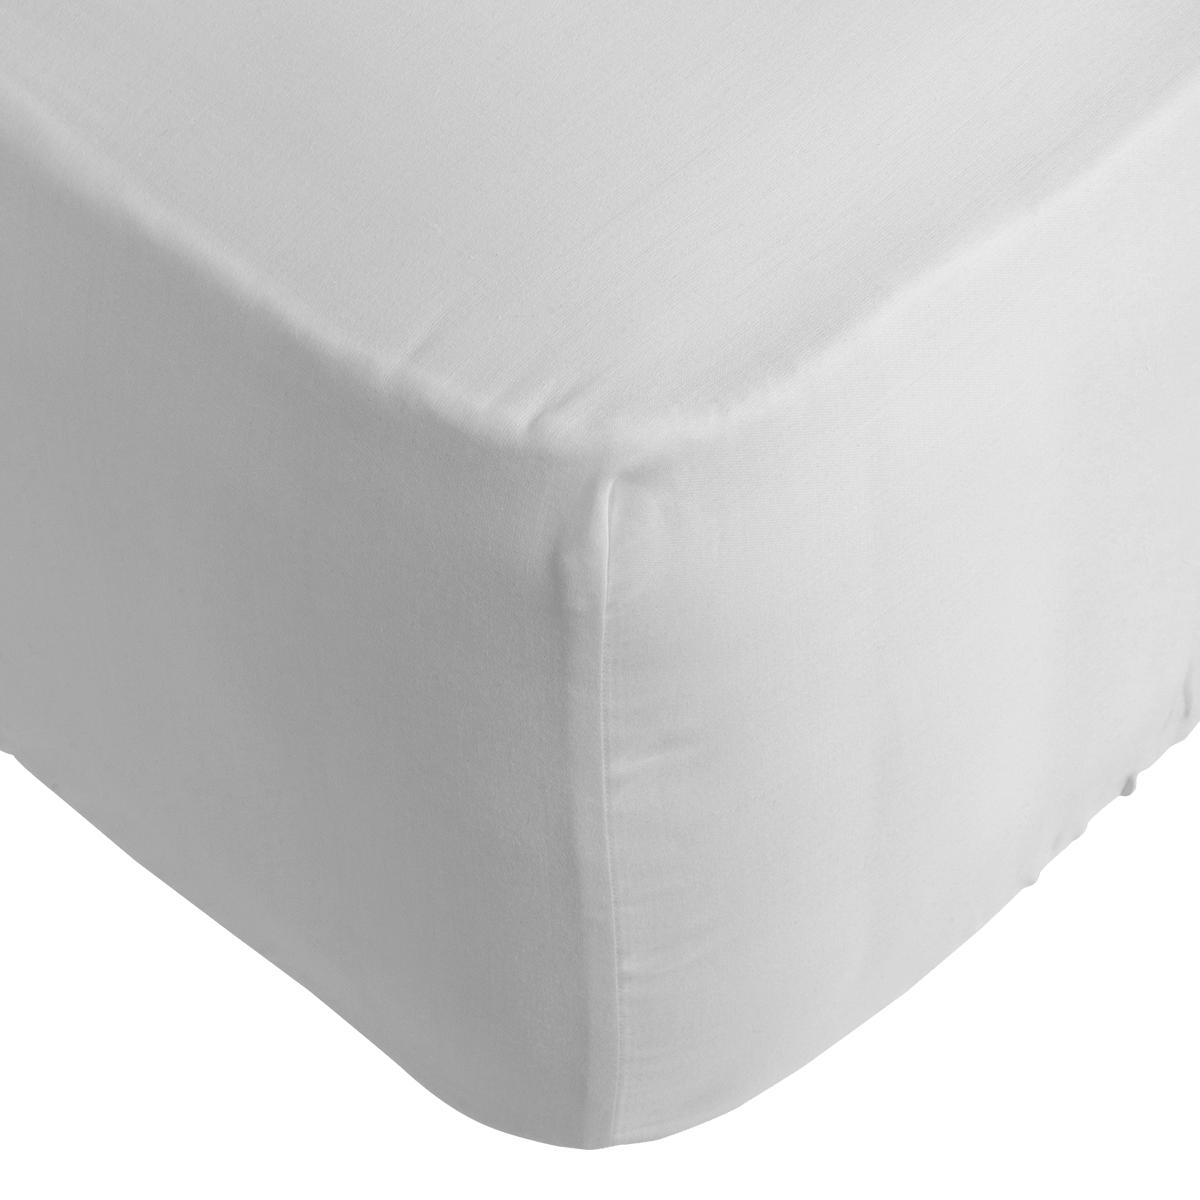 White 300 TC Easycare Cotton With Tencel King Size Flat Sheet